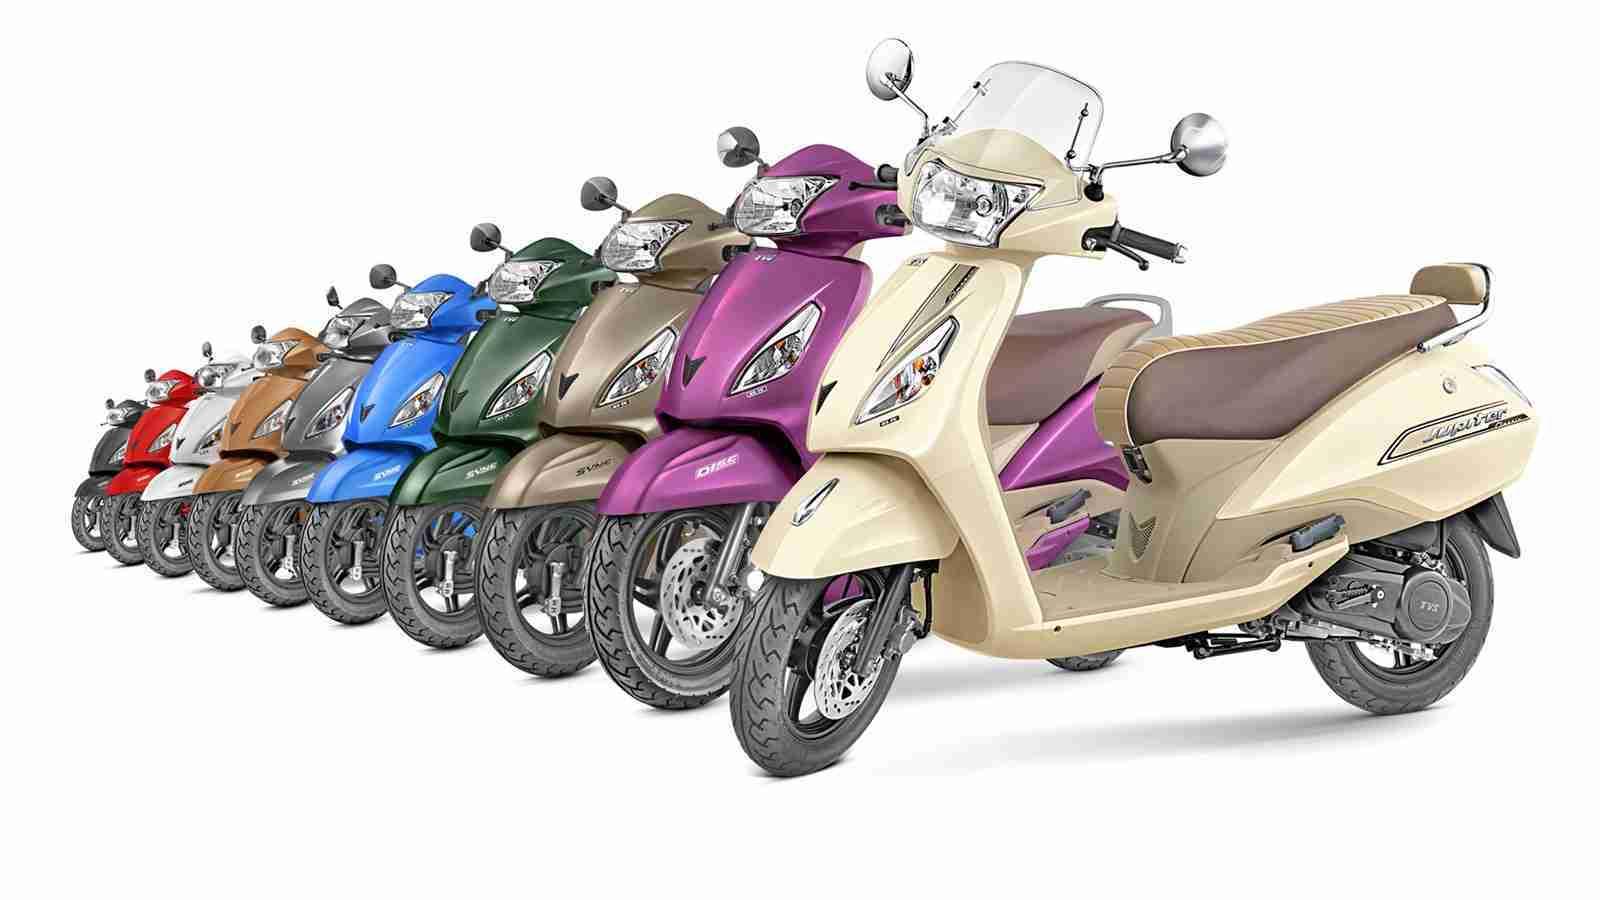 TVS Jupiter all colour options